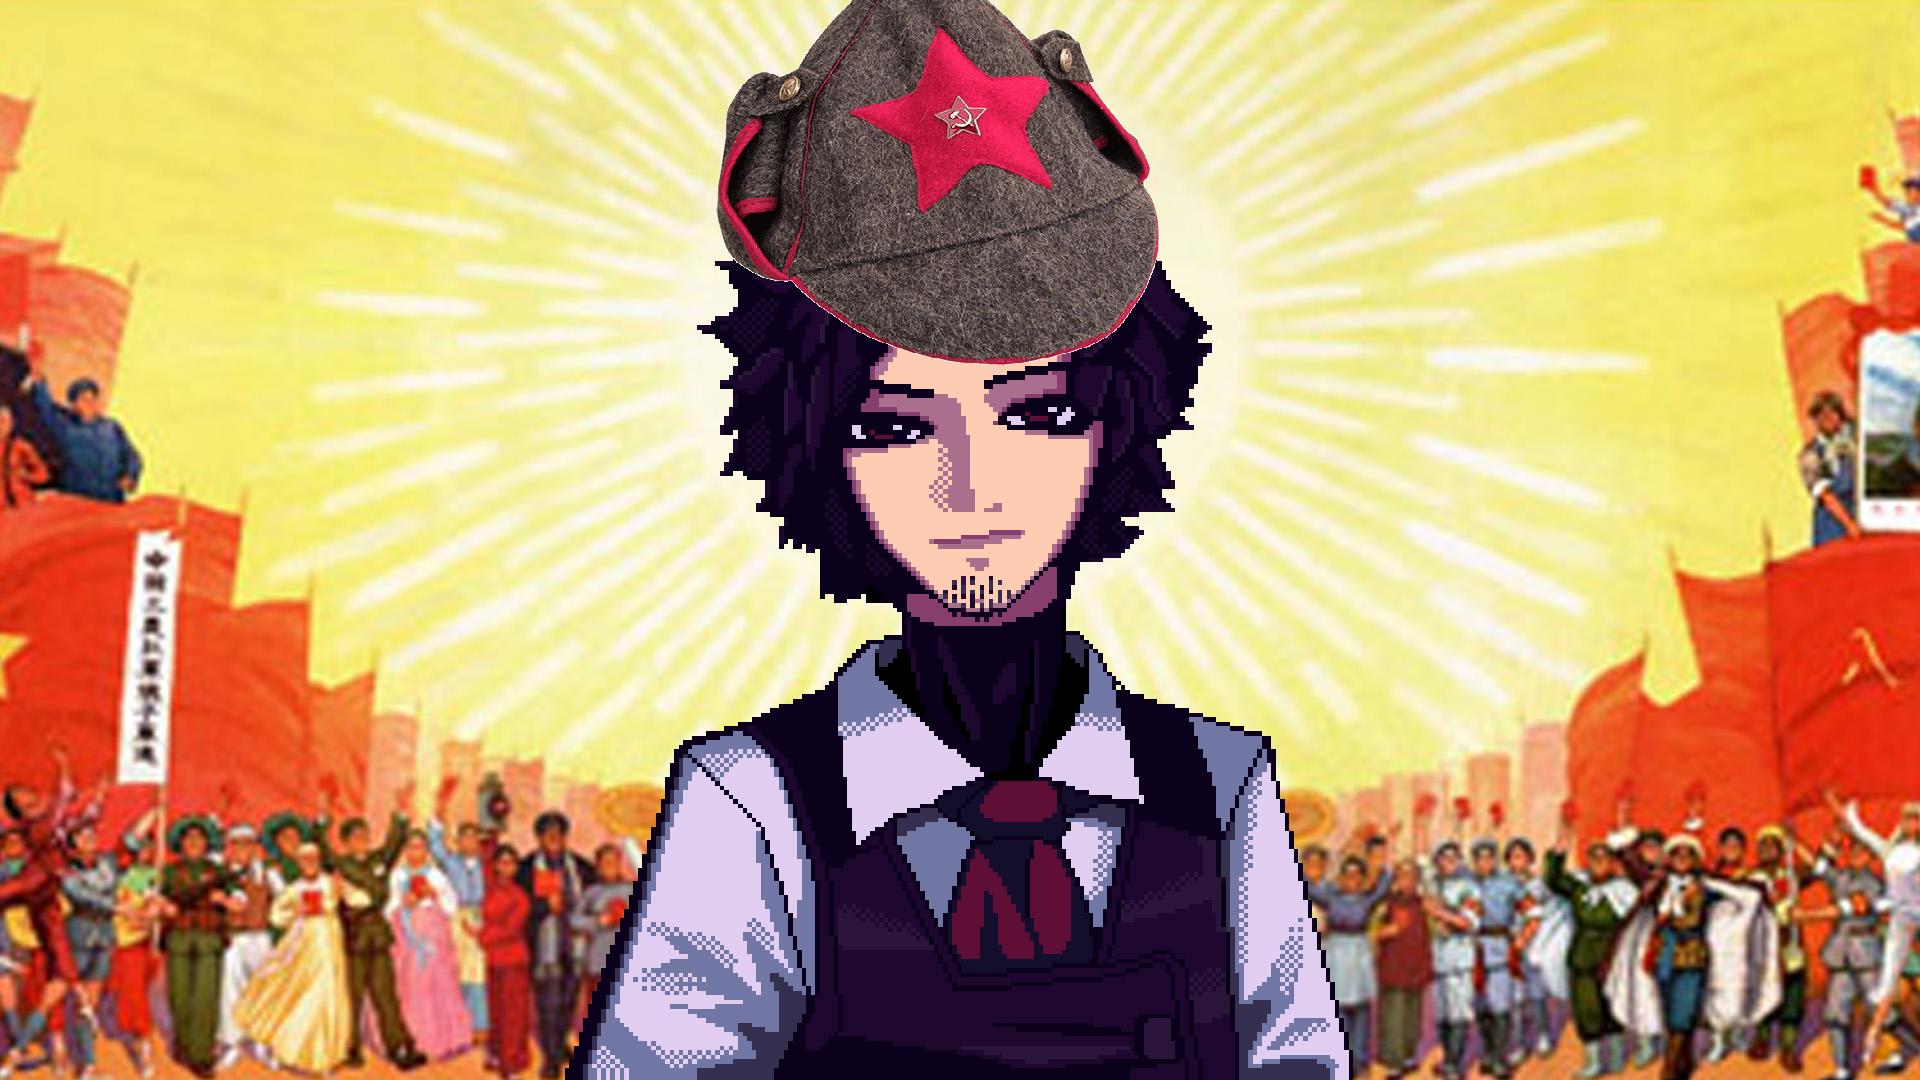 Is Gillian From Va 11 Hall A A Revolutionary Comrade Jaffameister